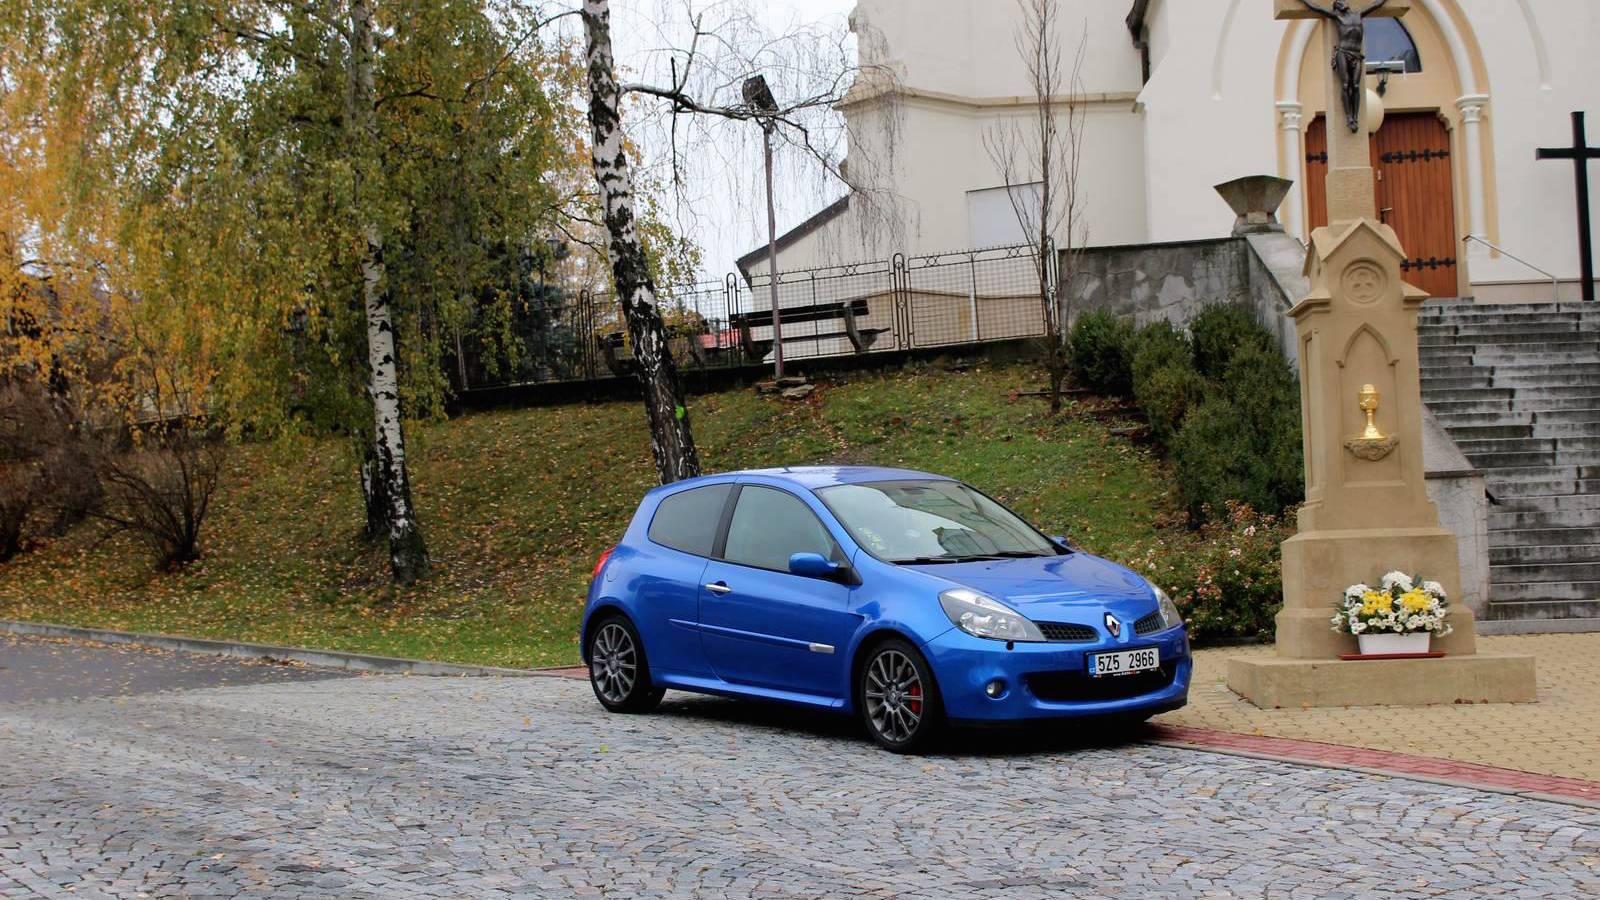 Blog: Automobilové božstvo, Clio RS a proud myšlenek